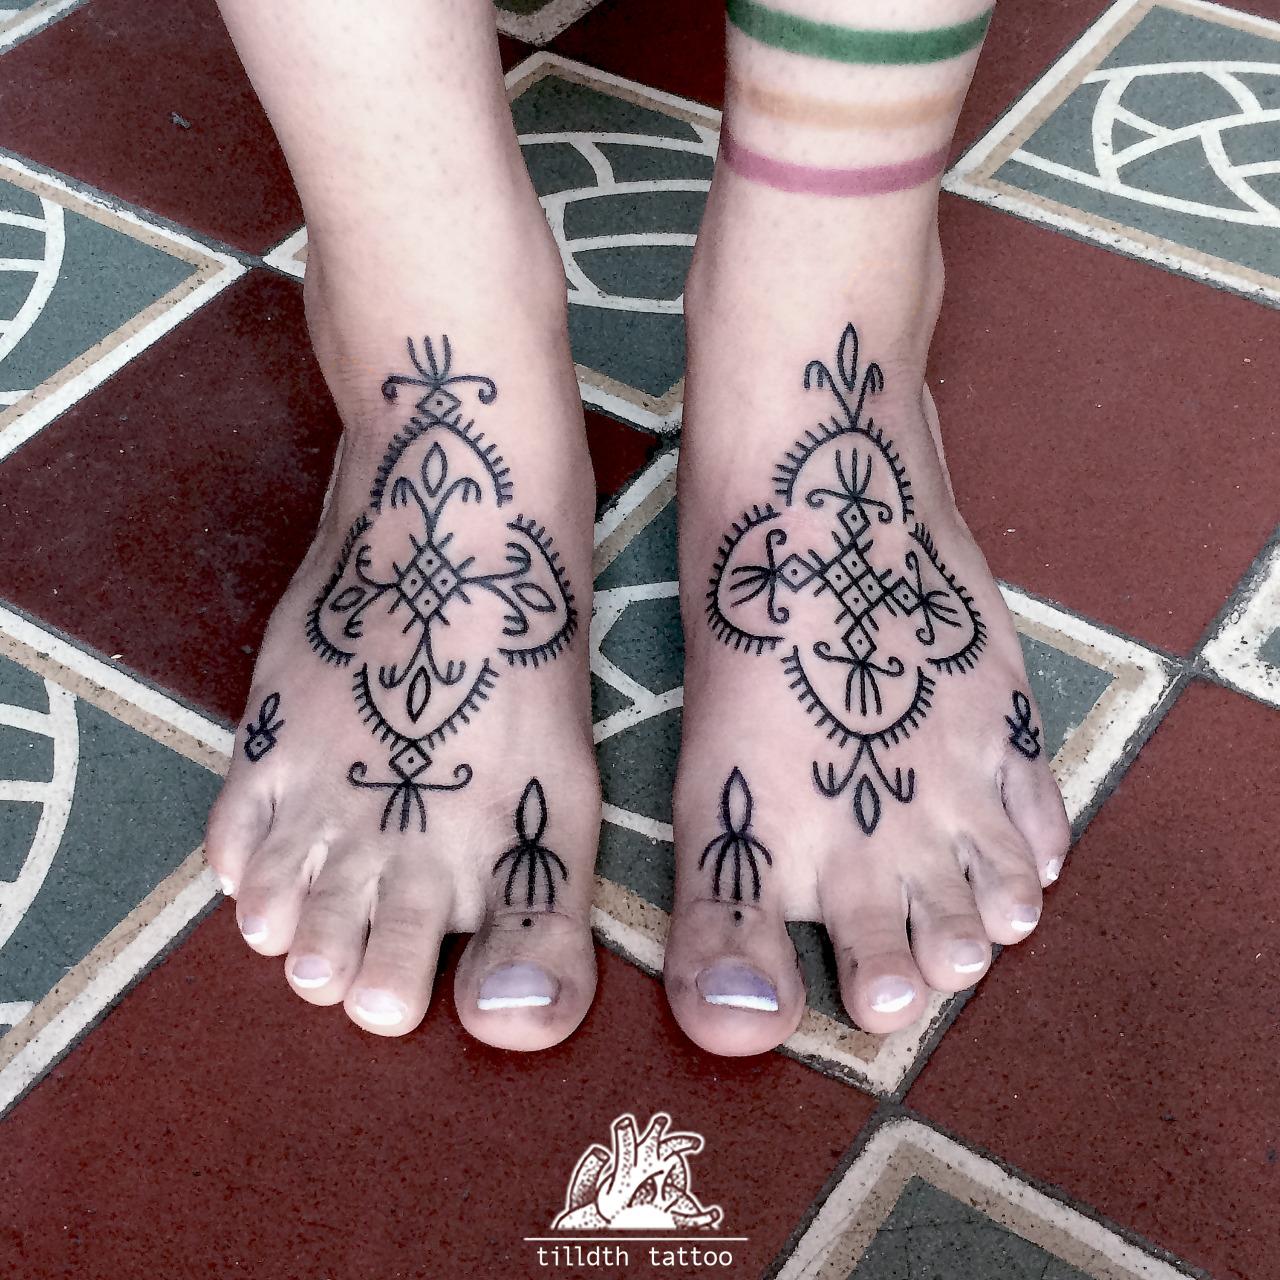 Tilldth Tattoo - the vandallist (5)